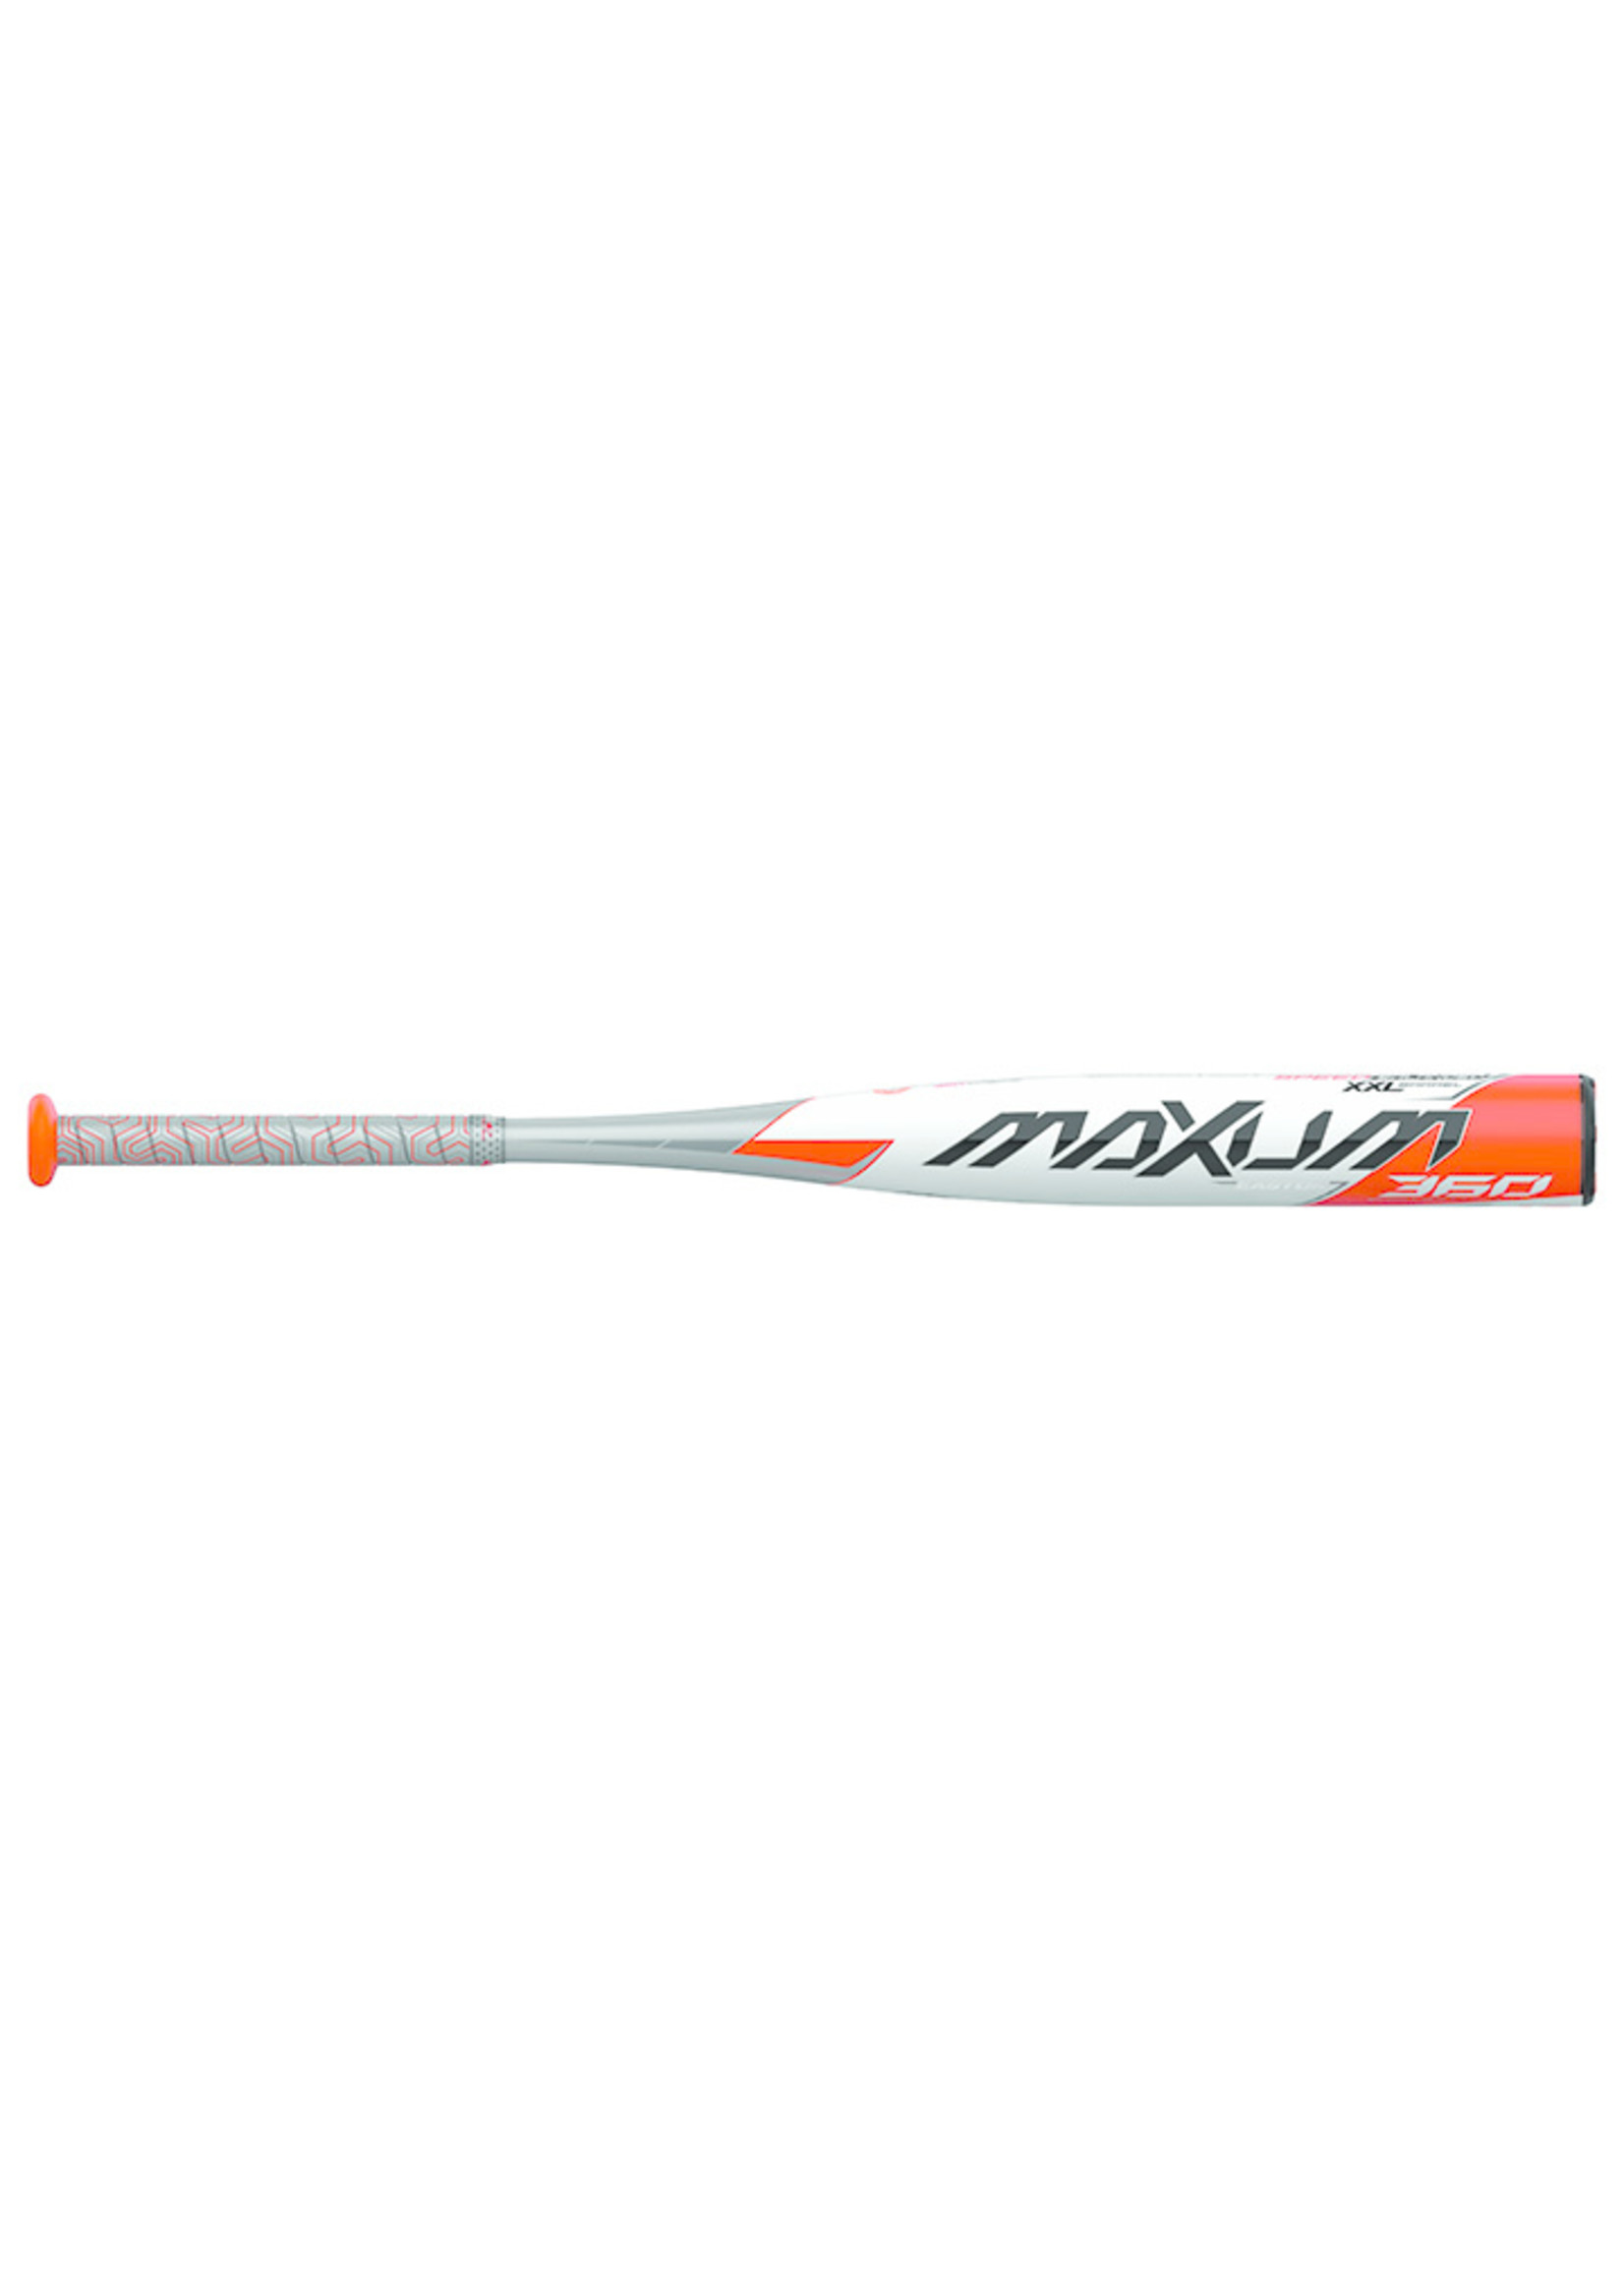 Easton Baseball (Canada) EASTON MAXUM 360 2 3/4'' (-10) BASEBALL BAT